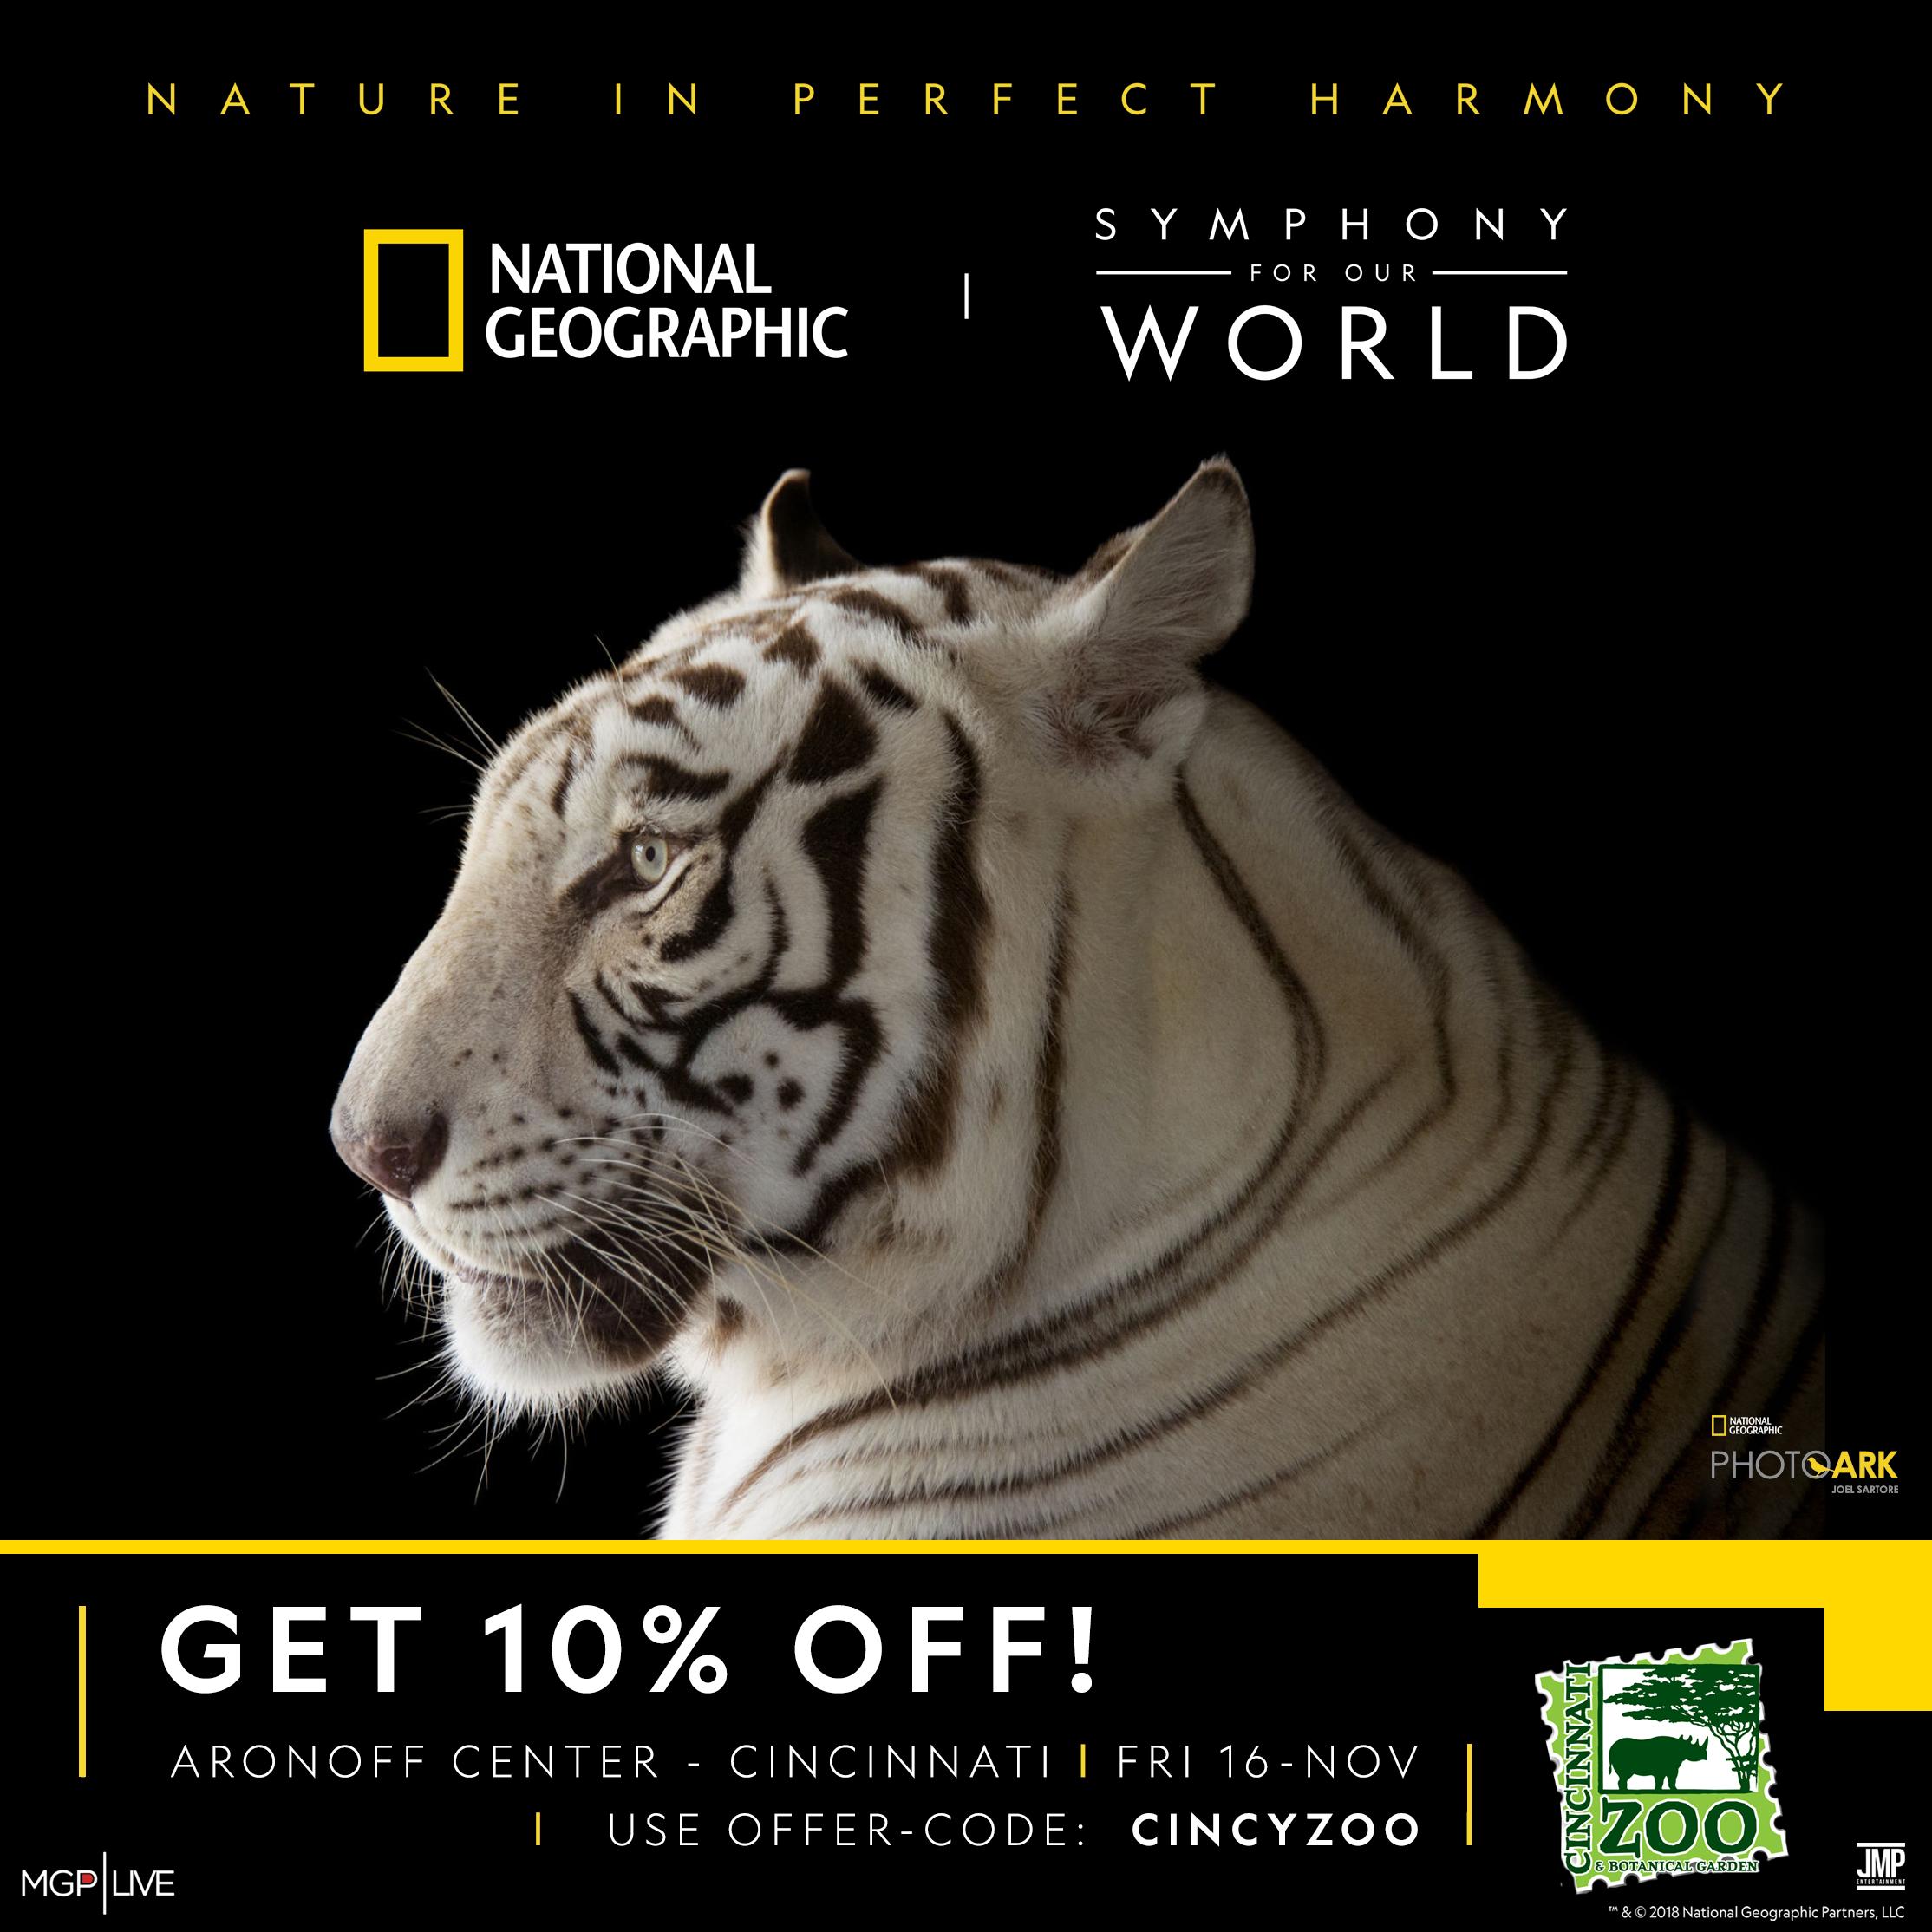 Discounts Promotions The Cincinnati Zoo Botanical Garden